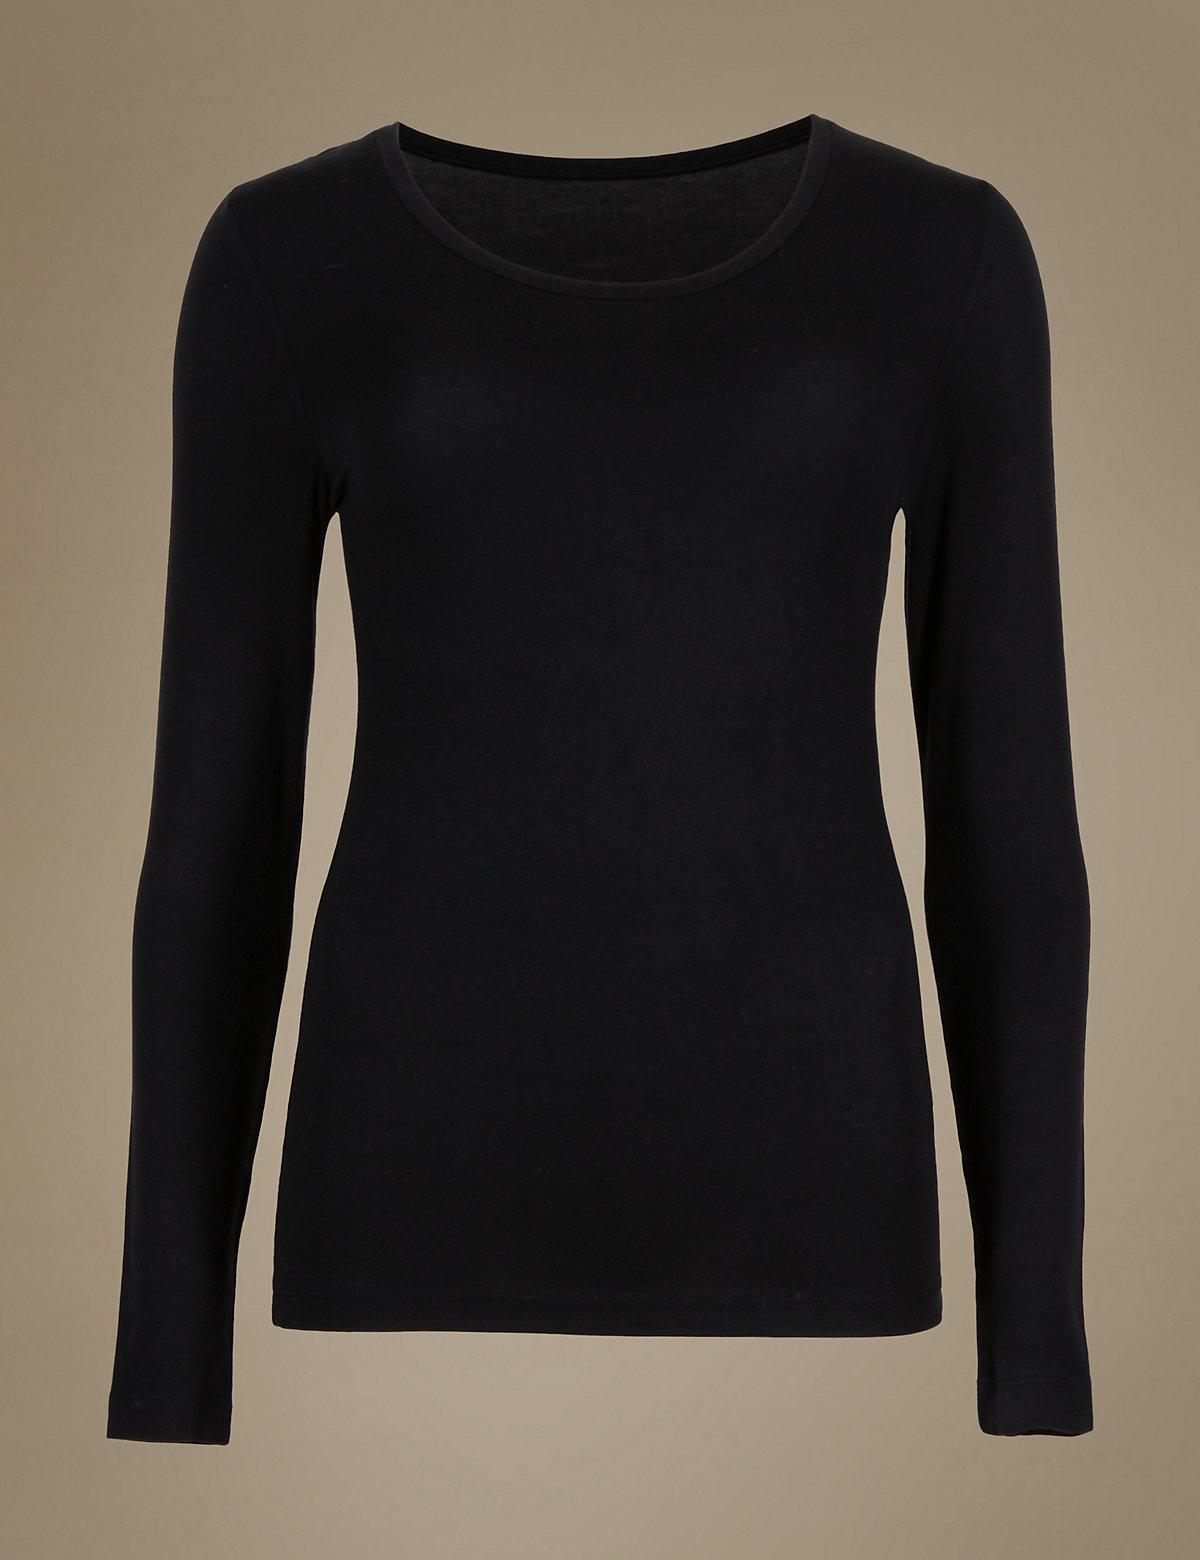 M S Woman Heatgen Thermal Long Sleeve Black T Shirt 2